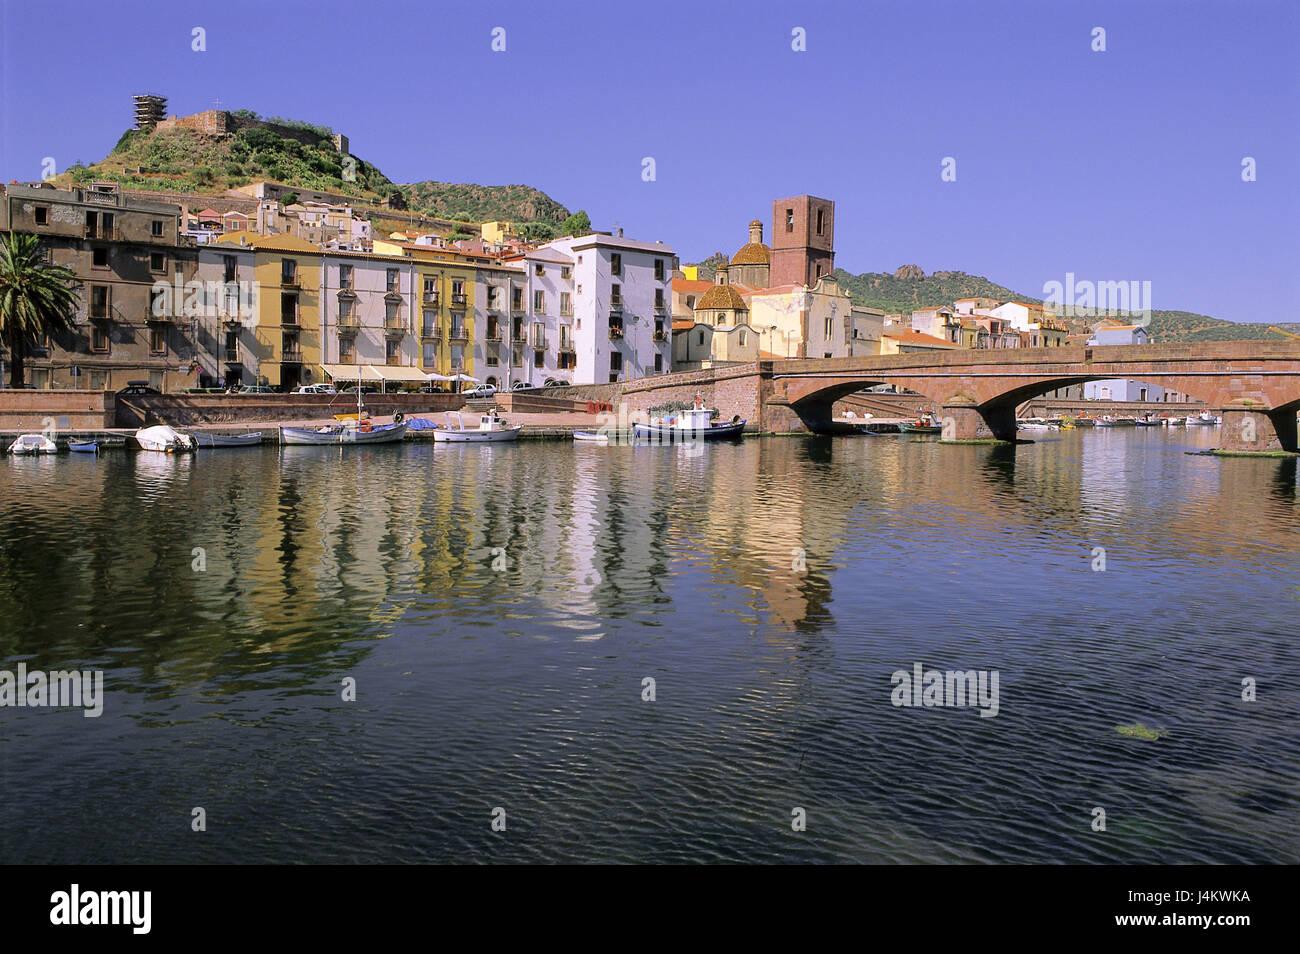 Italy, Sardinia, Bosa, town view Europe, the Mediterranean Sea, island, northwest coast, holiday resort, houses, - Stock Image